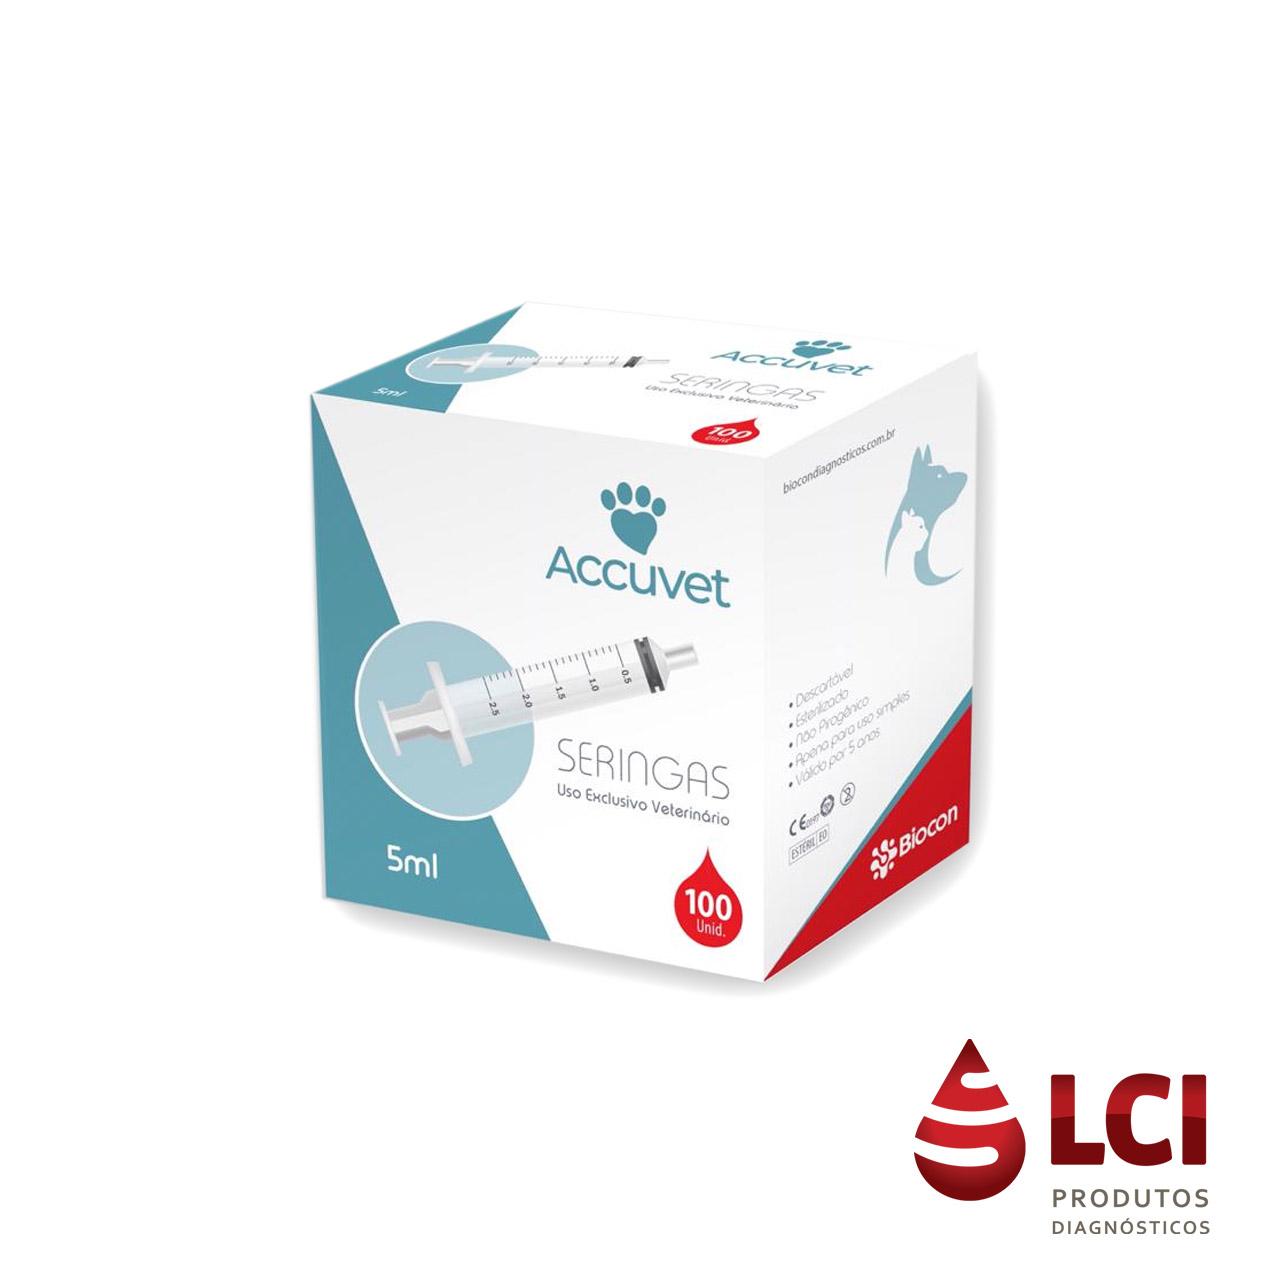 Seringa LS  S/AG  Descartáveis 5ml C/ 100 Accuvet